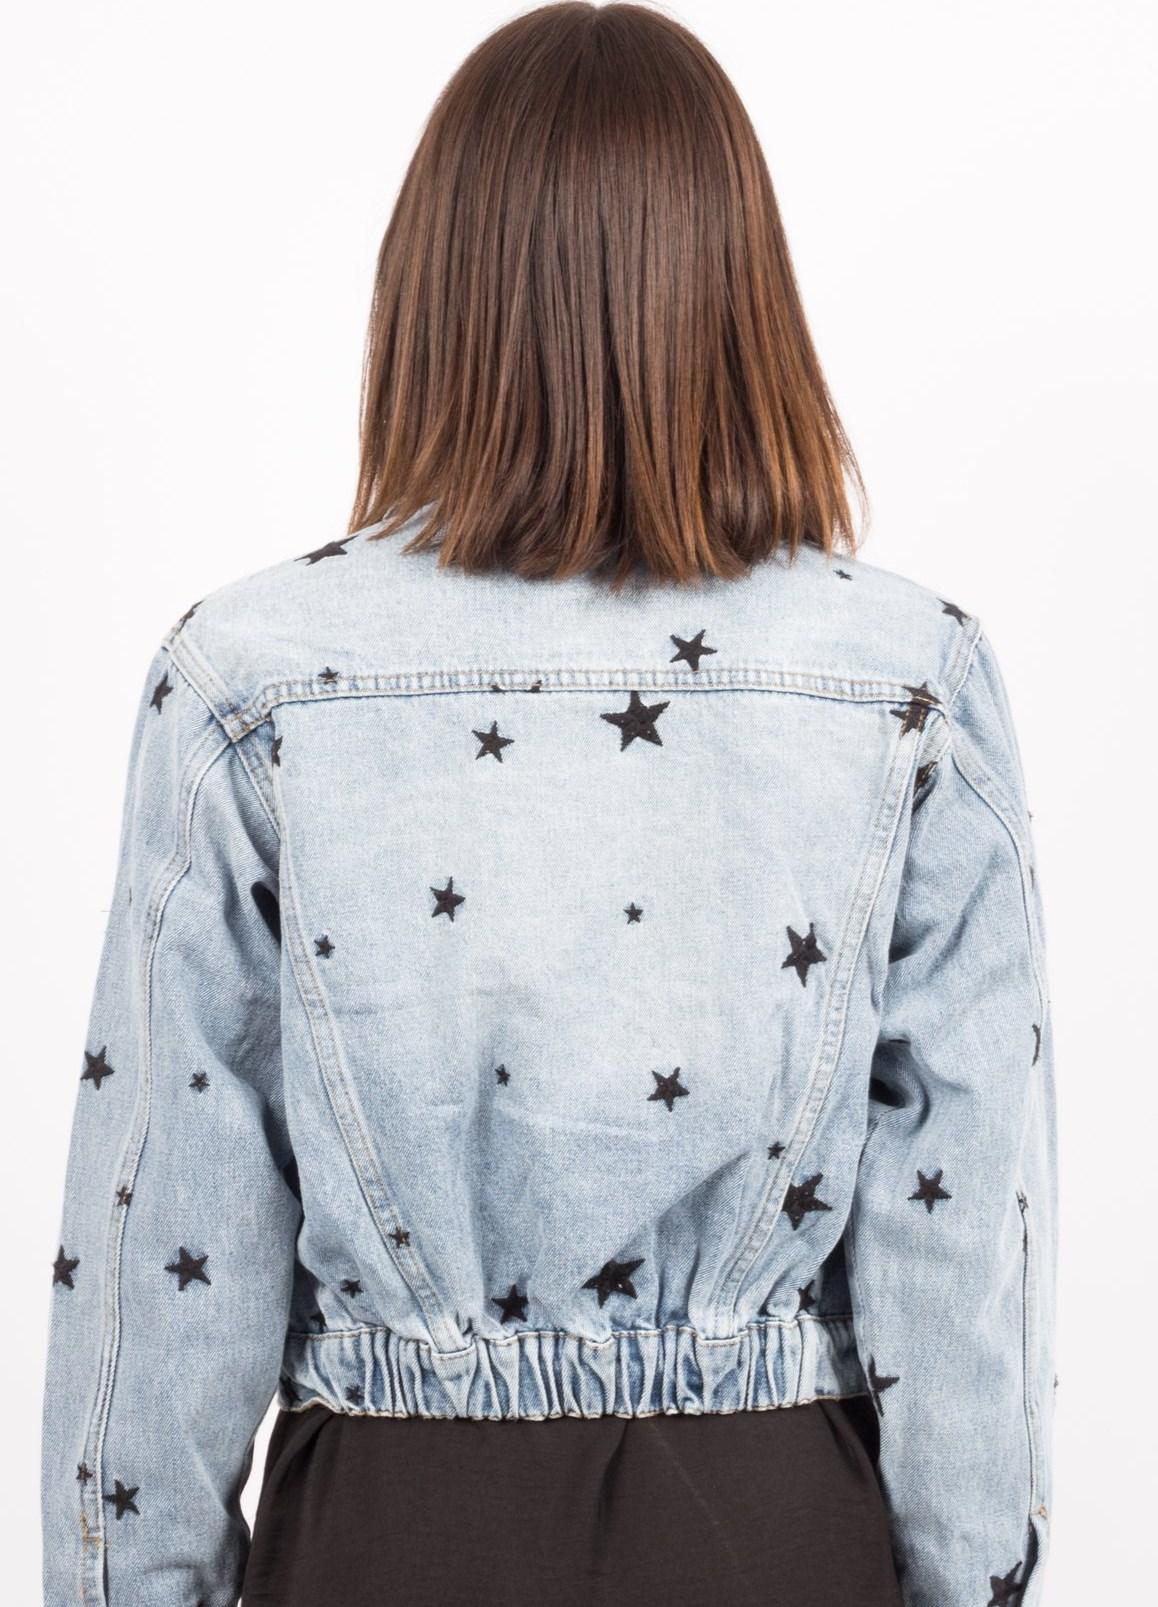 amuse society star jacket 1.jpg